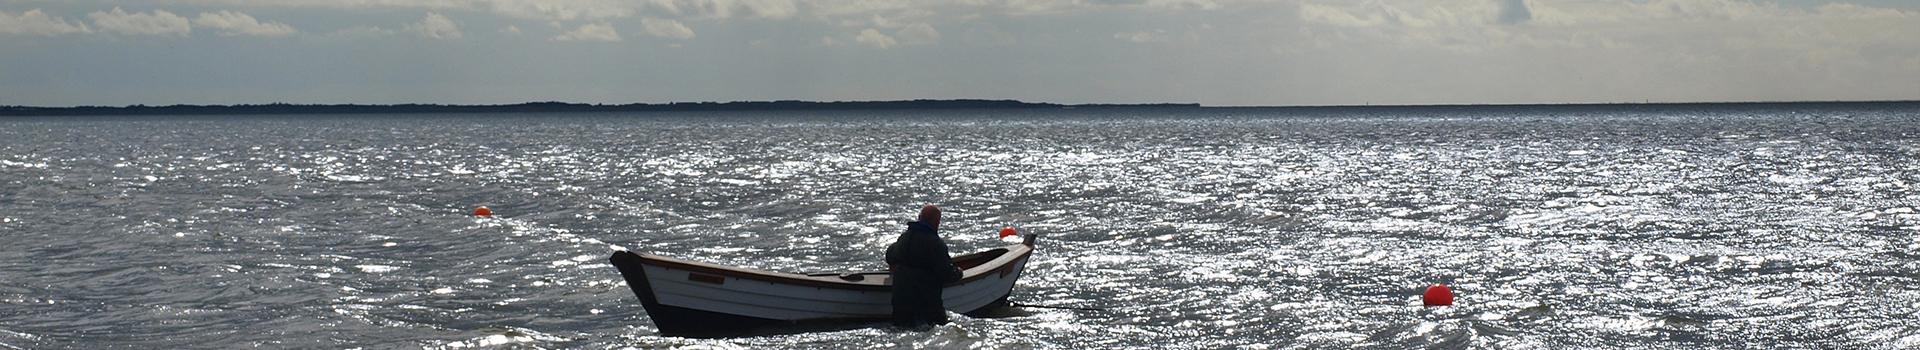 Slide-16-Mand-Båd